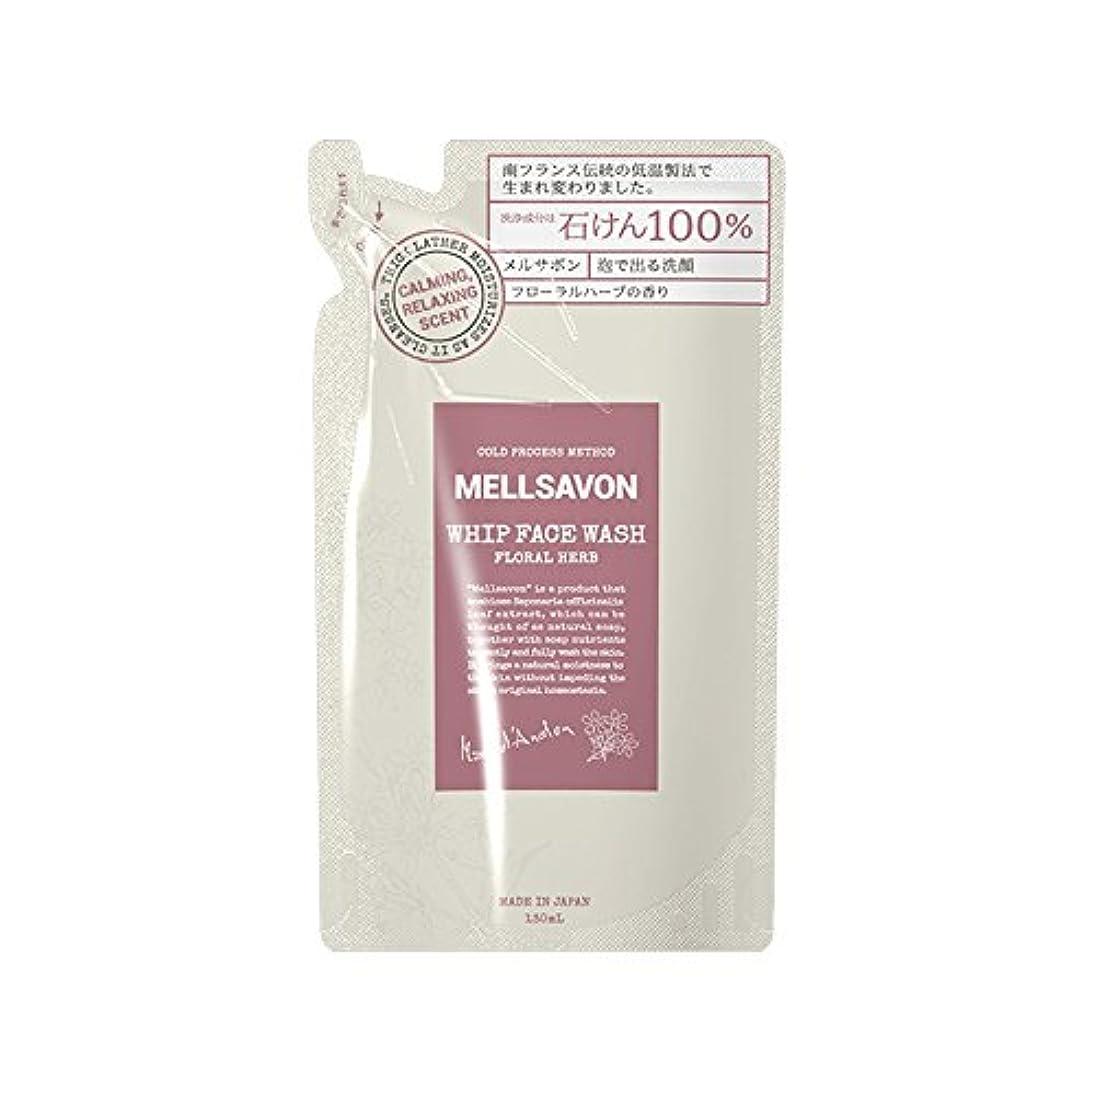 MELLSAVON(メルサボン) ホイップフェイスウォッシュ フローラルハーブ 〈詰替〉 (130mL)